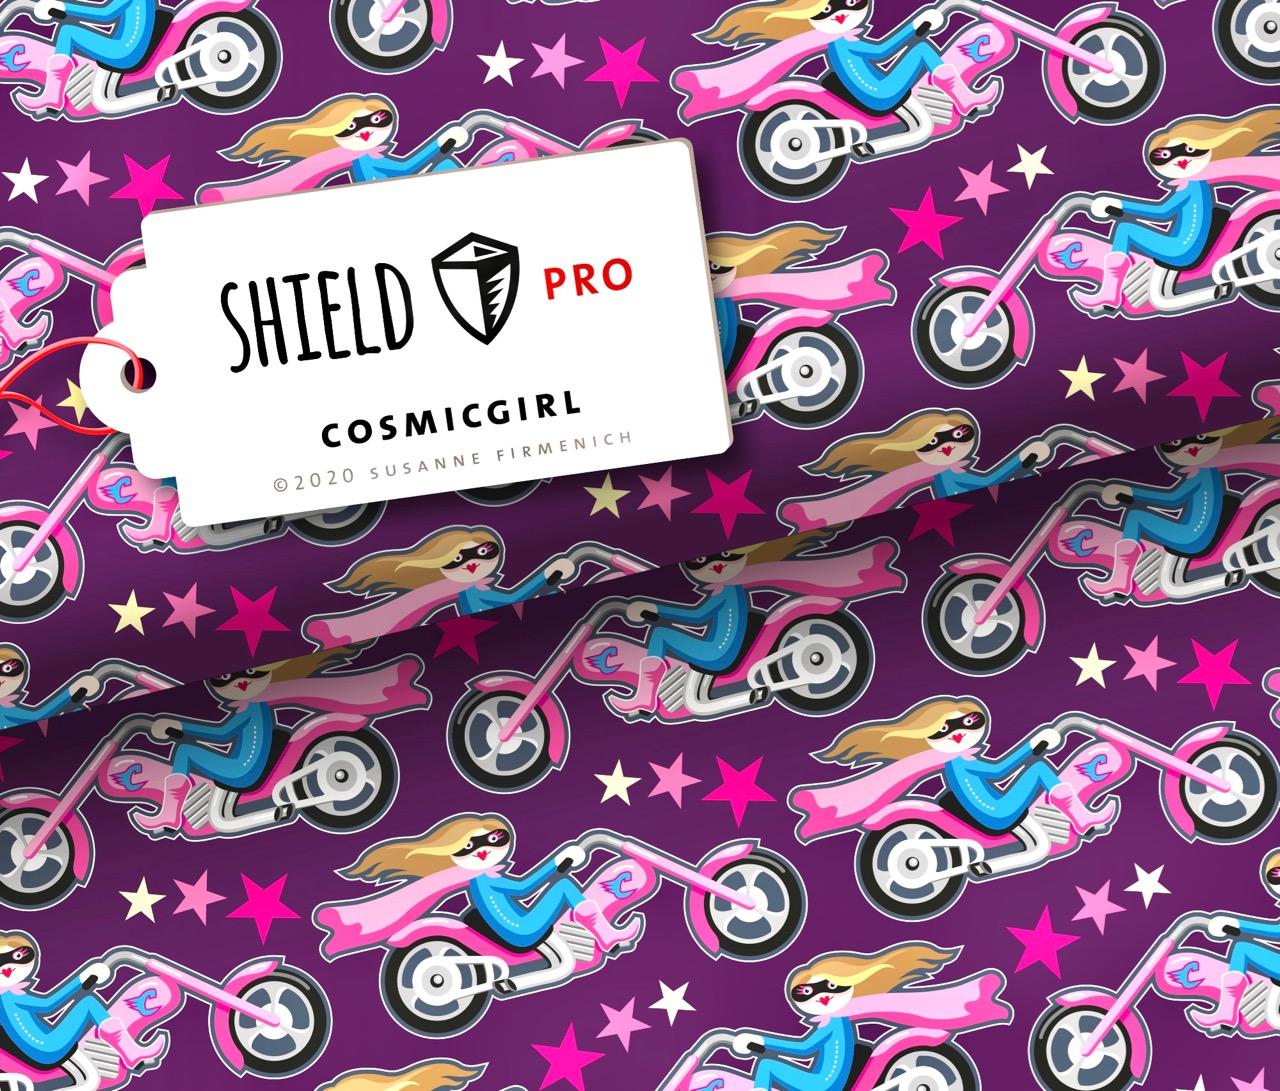 Shield PRO KIDS - Cosmicgirl Violett von Hamburger Liebe & Albstoffe - antimikrobiell